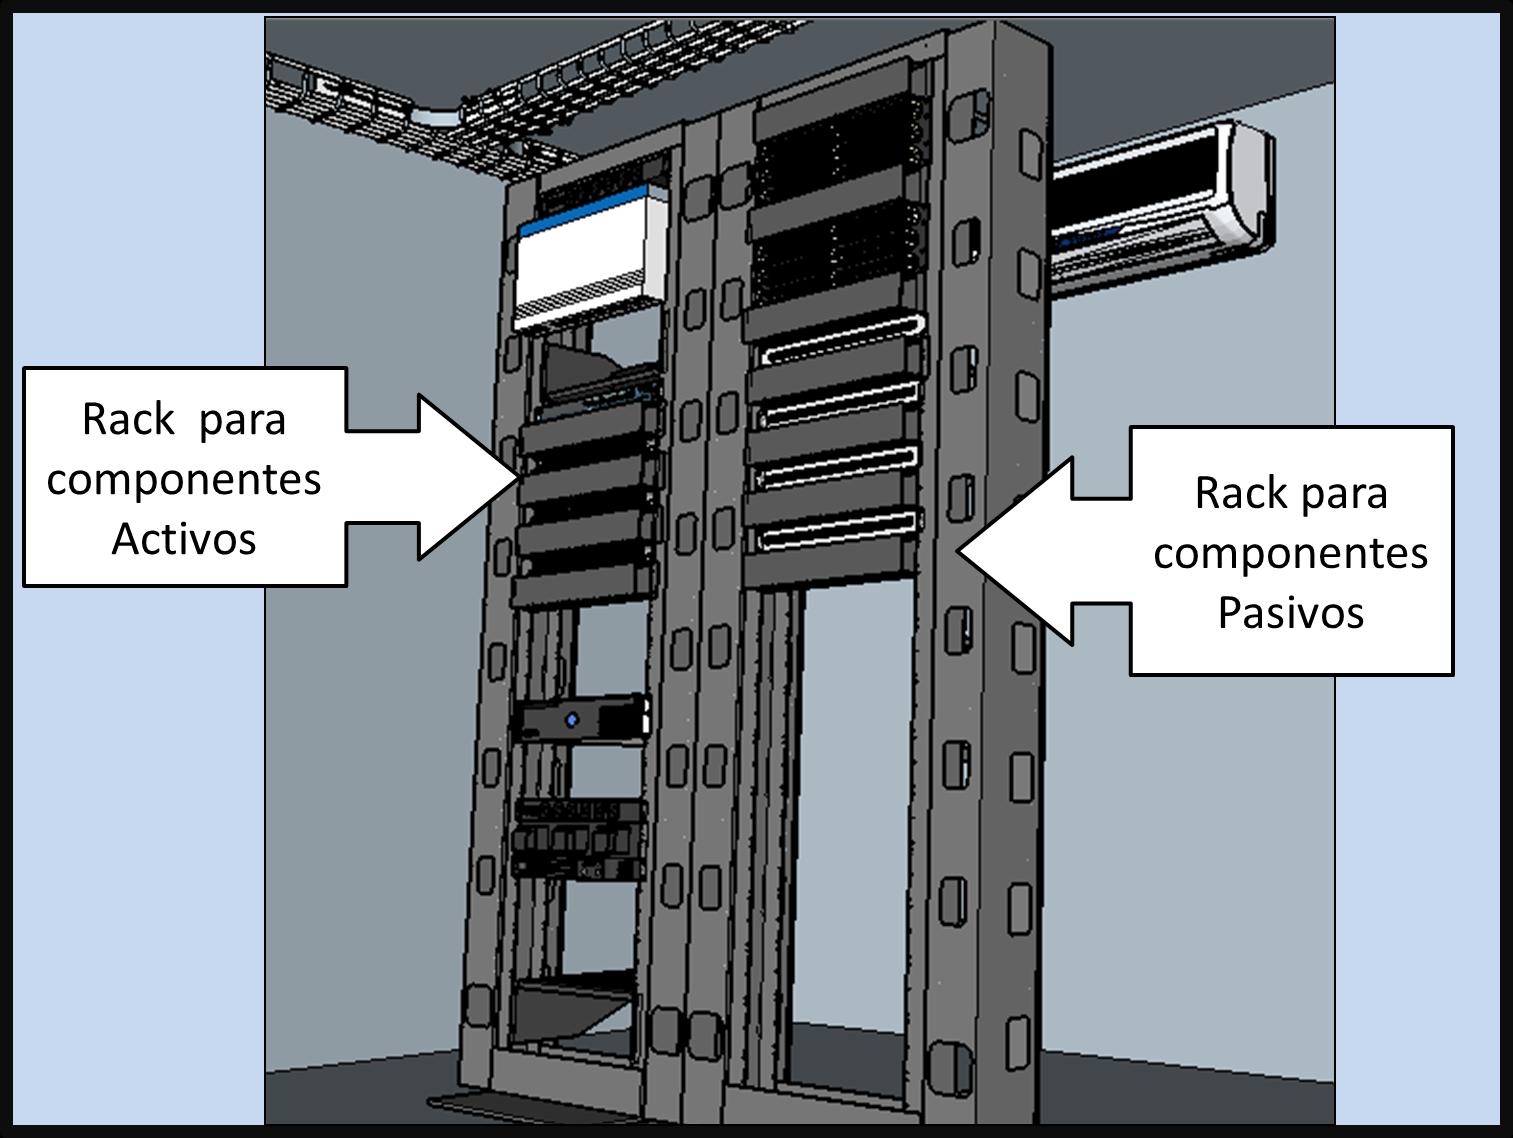 arquitectura de redes: UN CUARTO DE TELECOMUNICACIONES OPTIMO